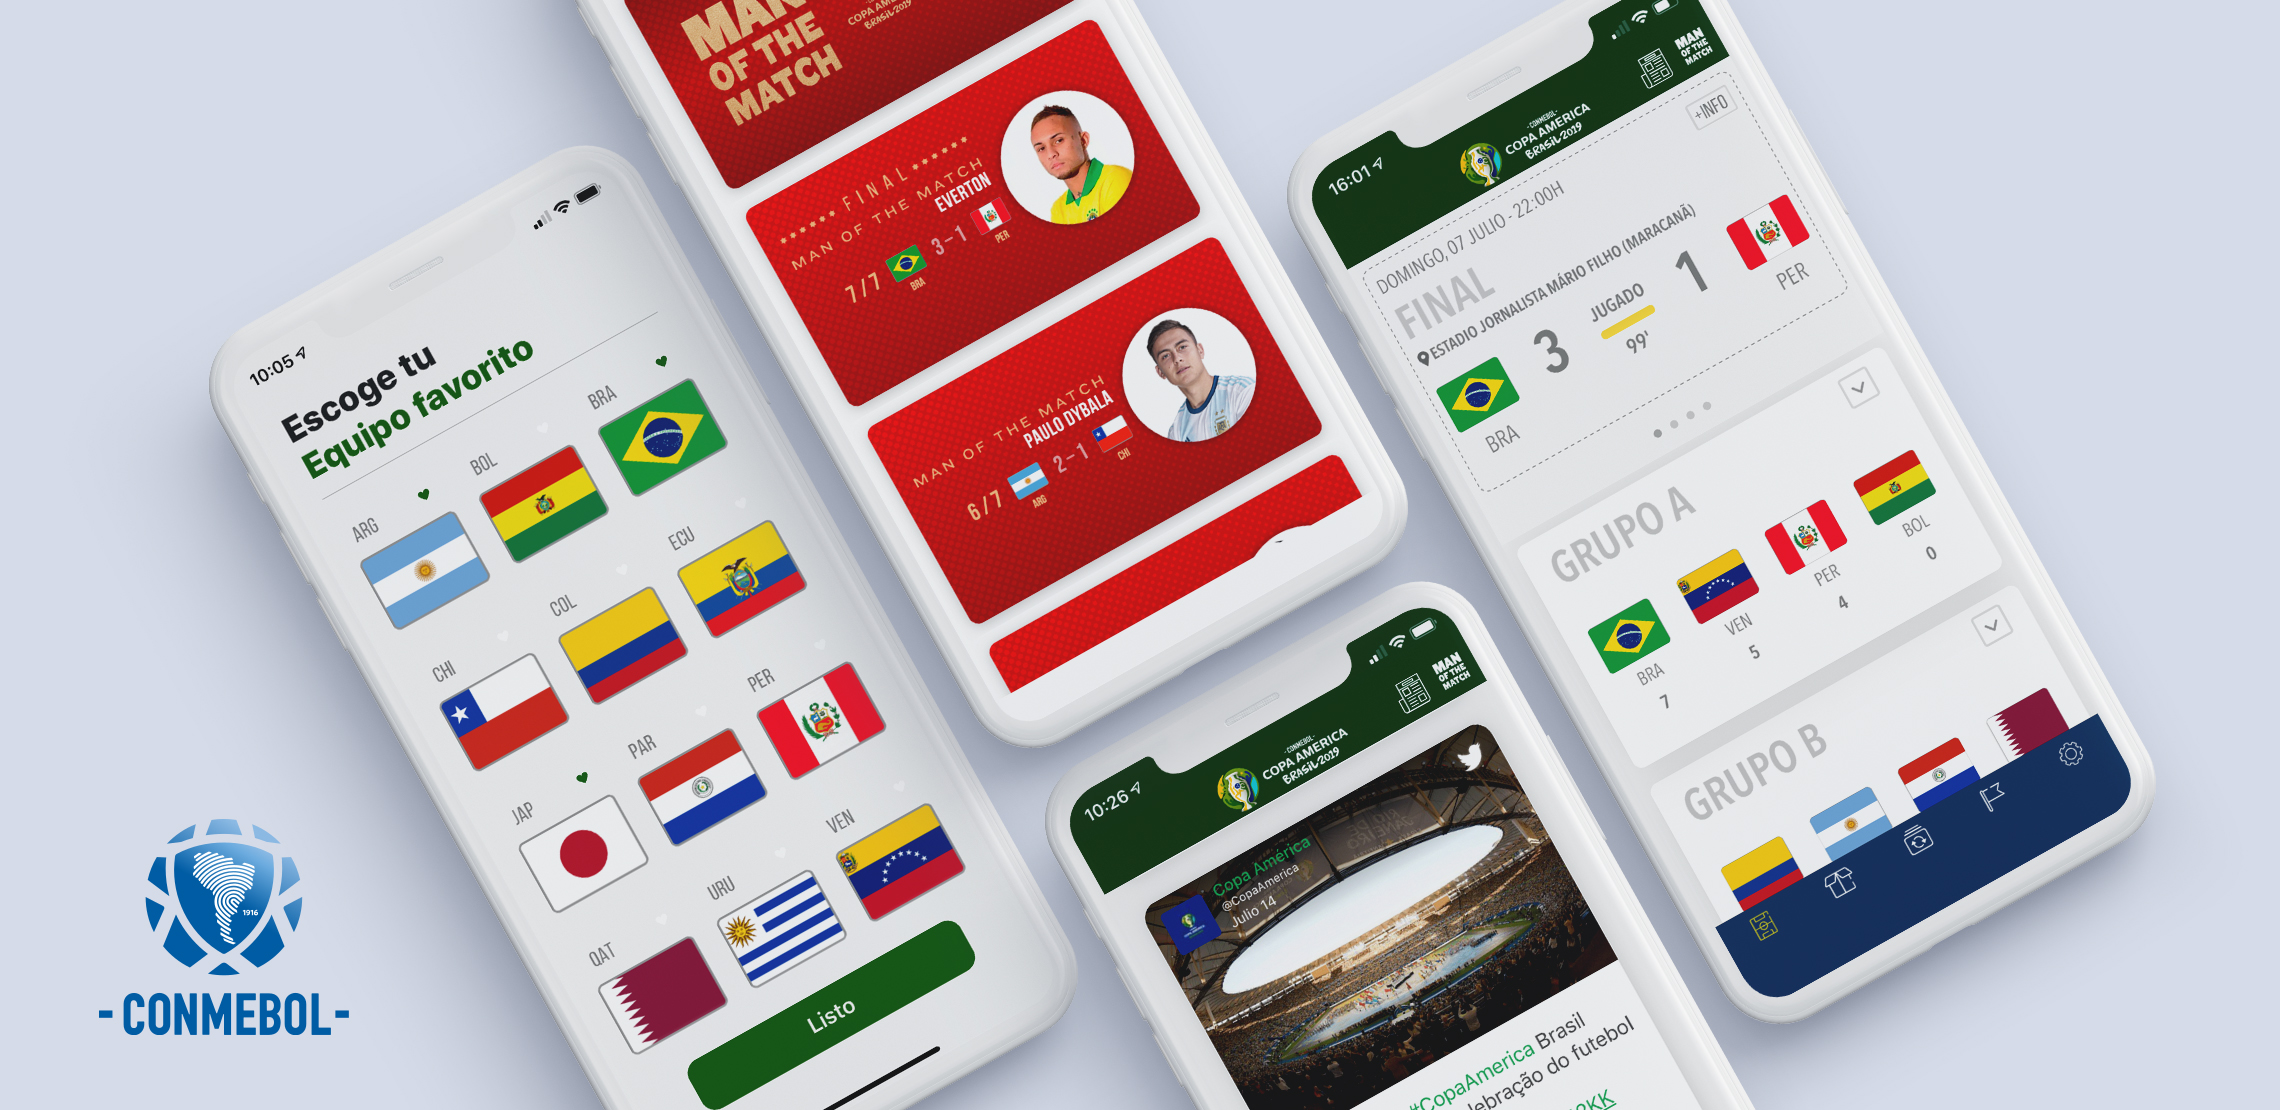 Conmebol copa america mobile Mockups_1